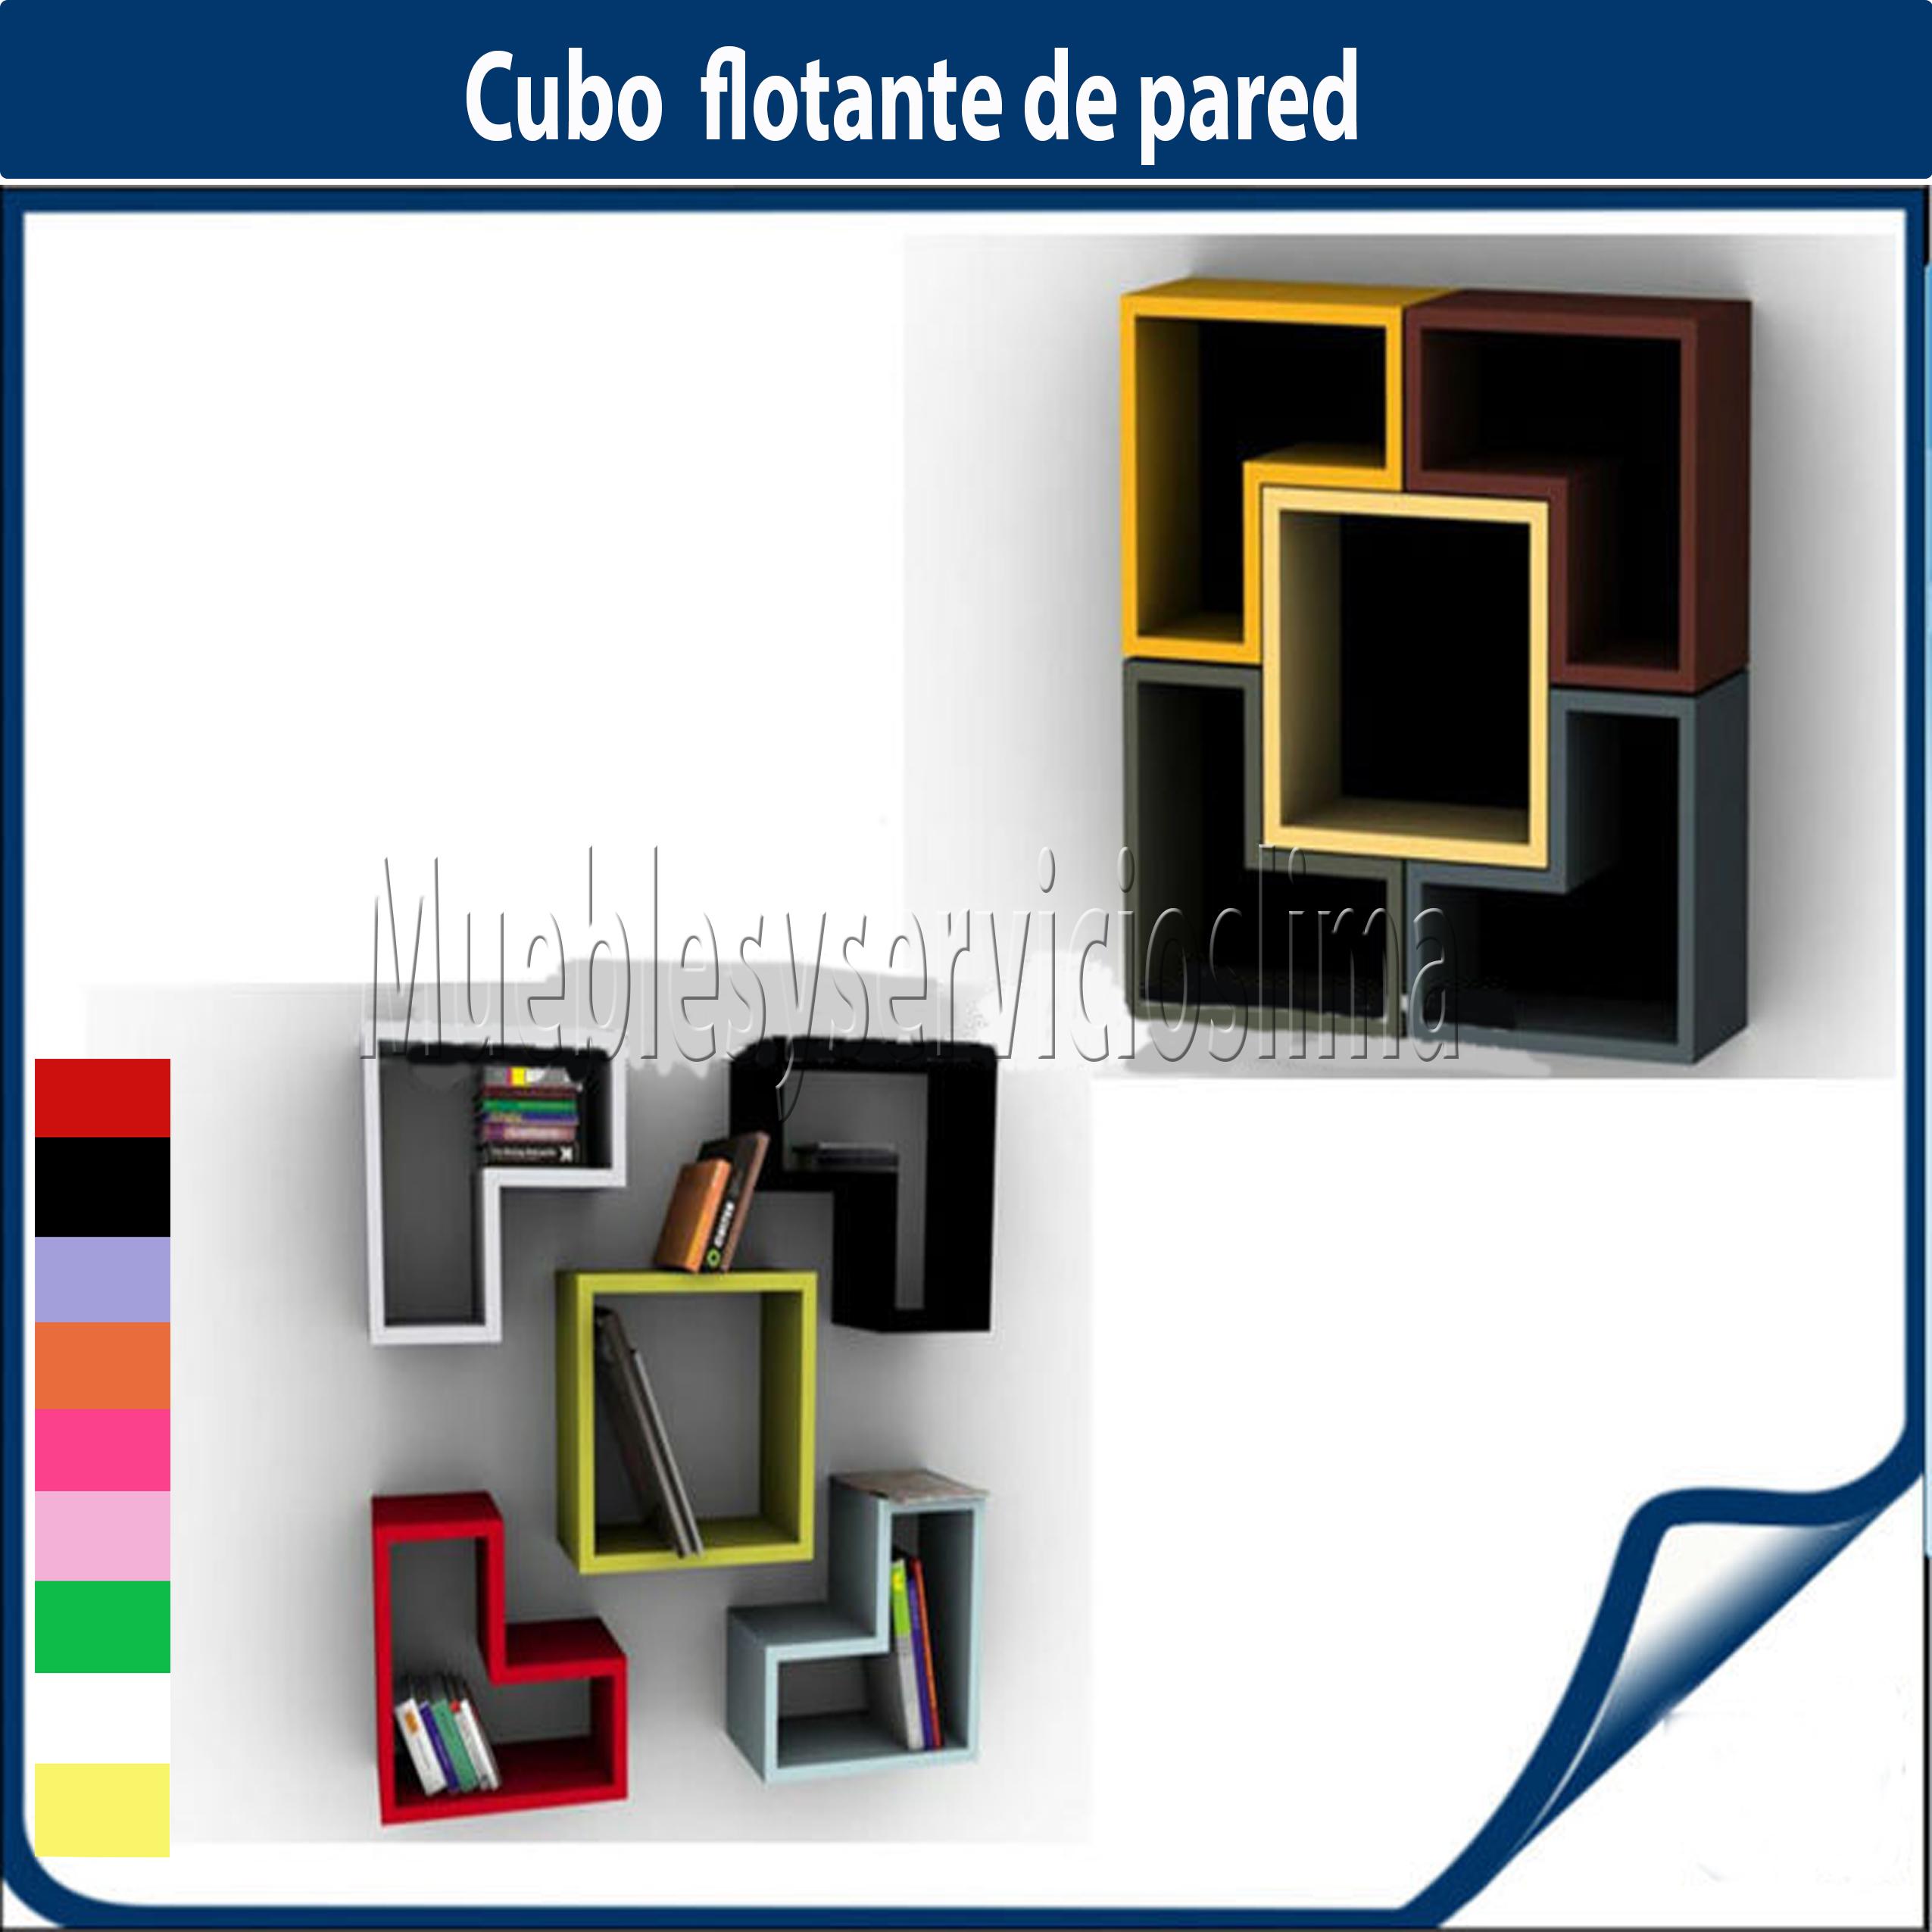 cubo-flotante-pared